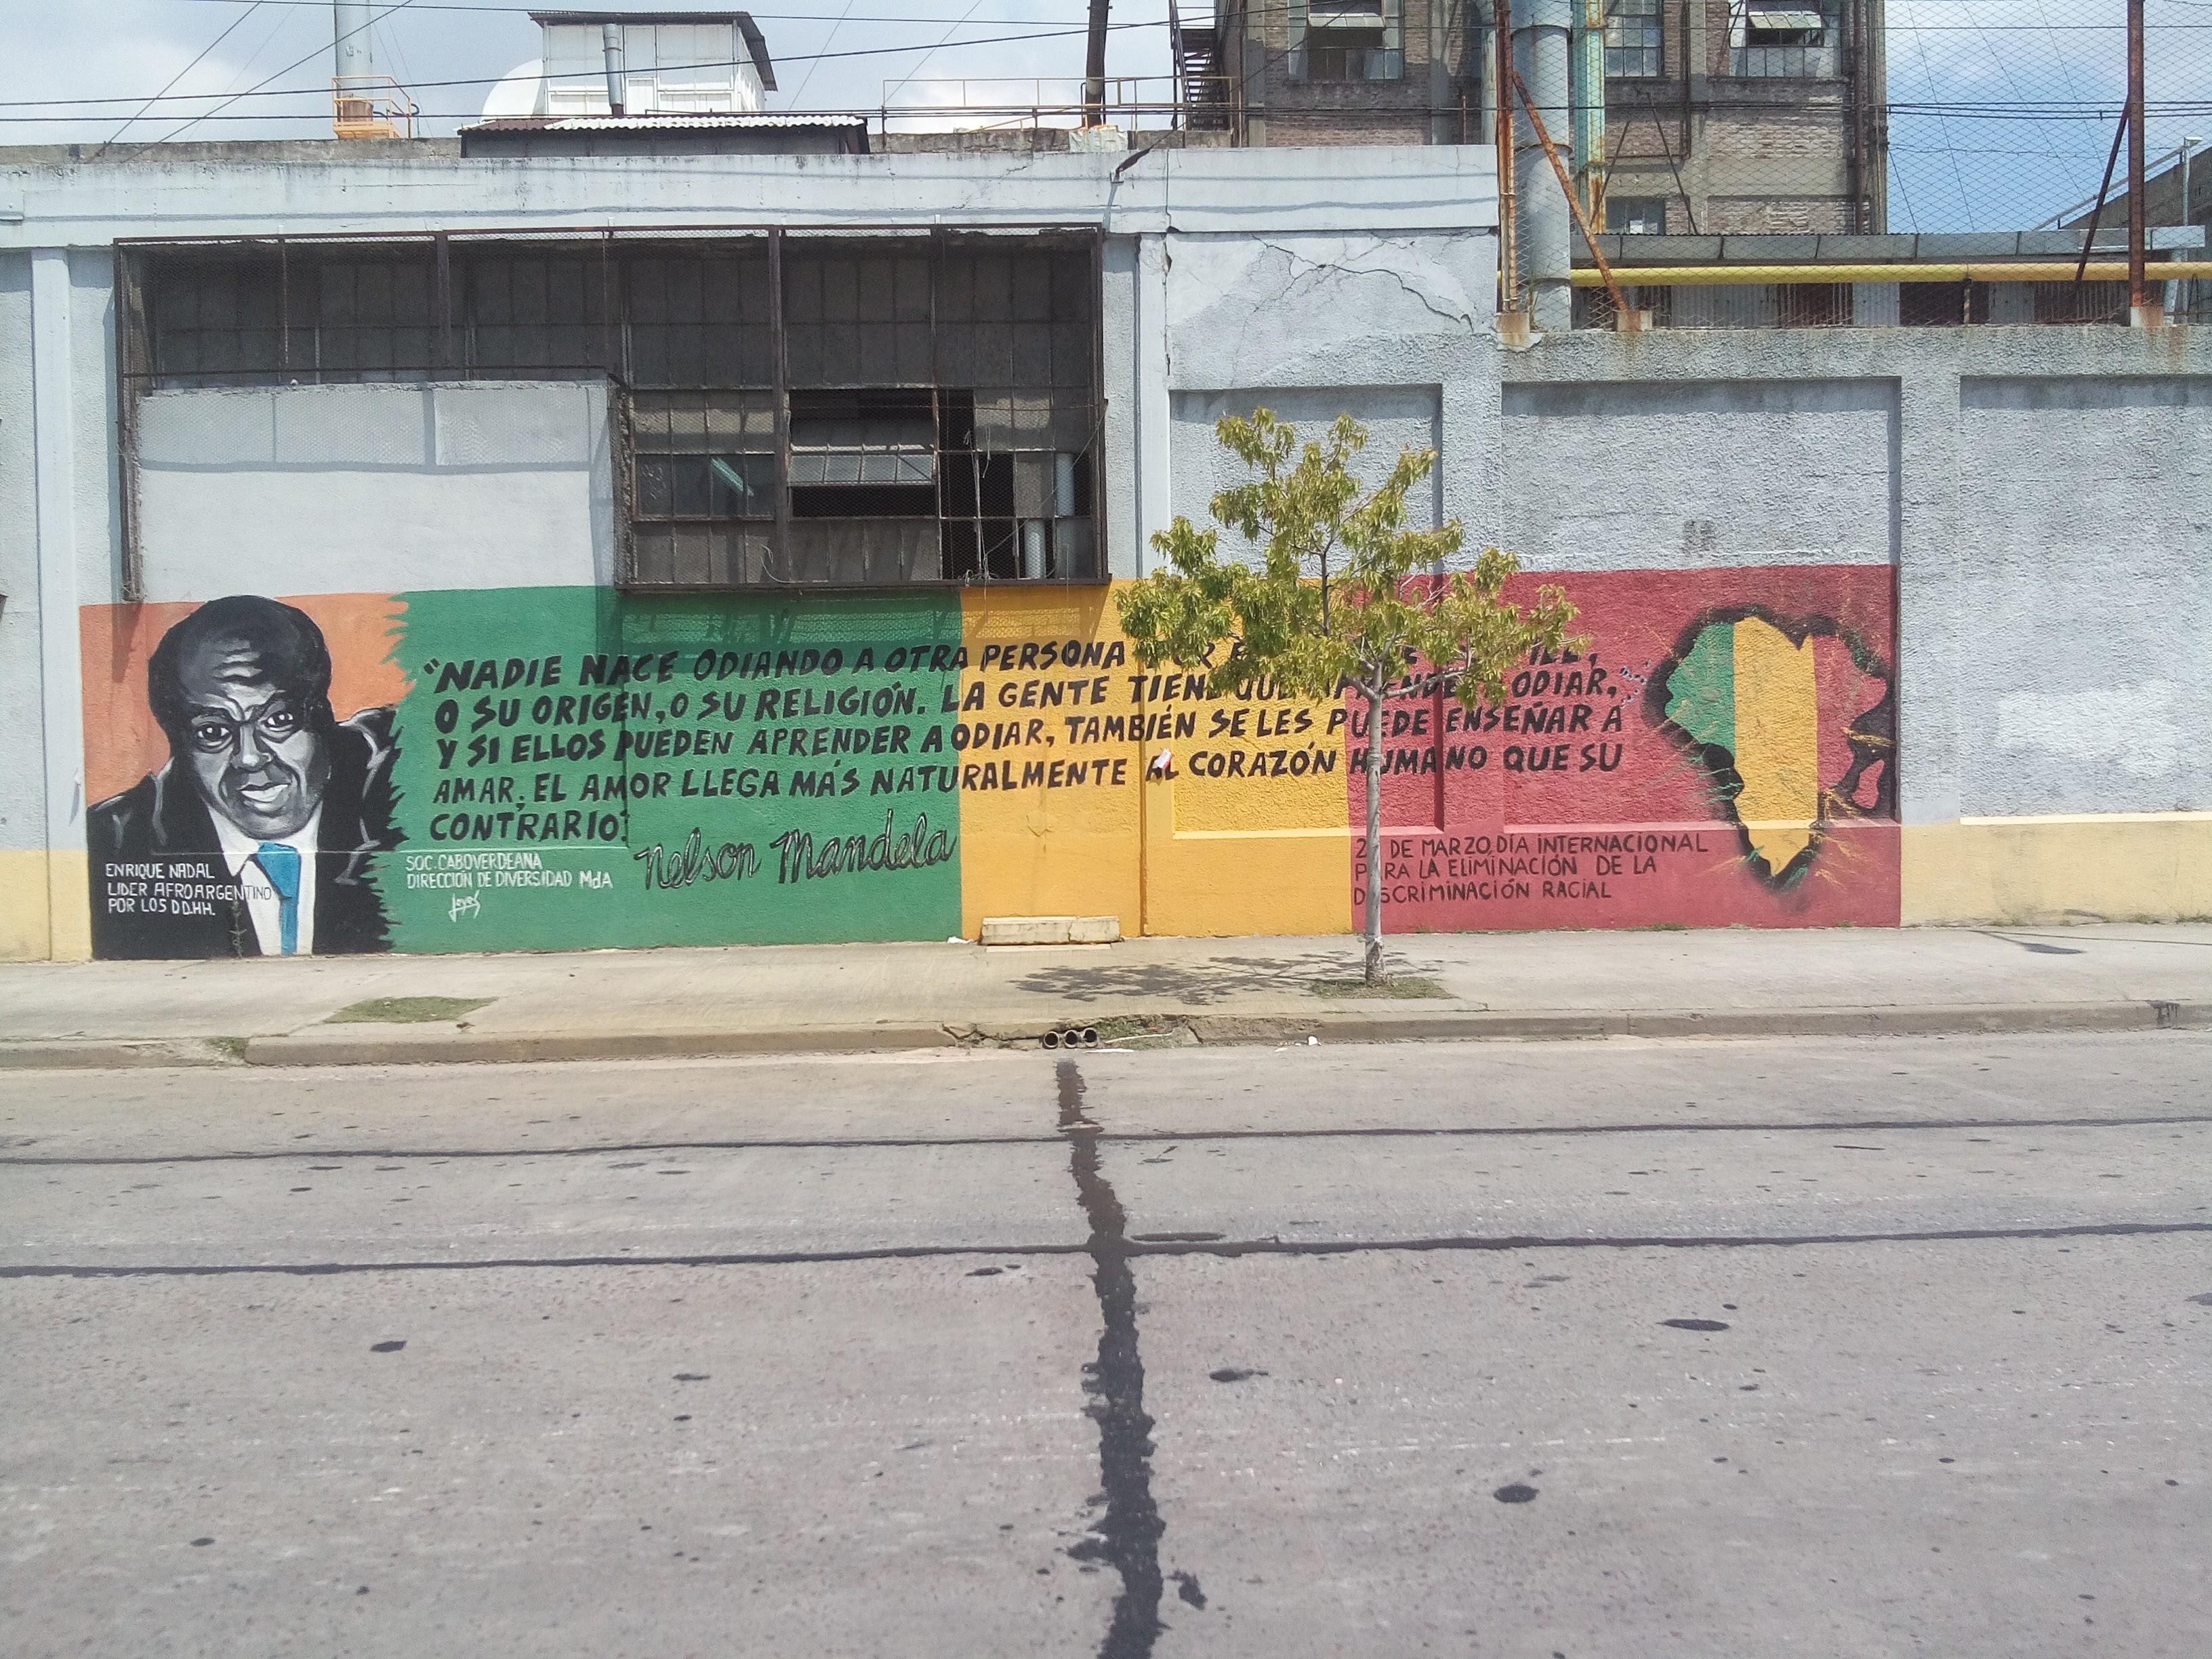 Comunidad Caboverdeana - Mural de la Comunidad Caboverdeana de Avellaneda